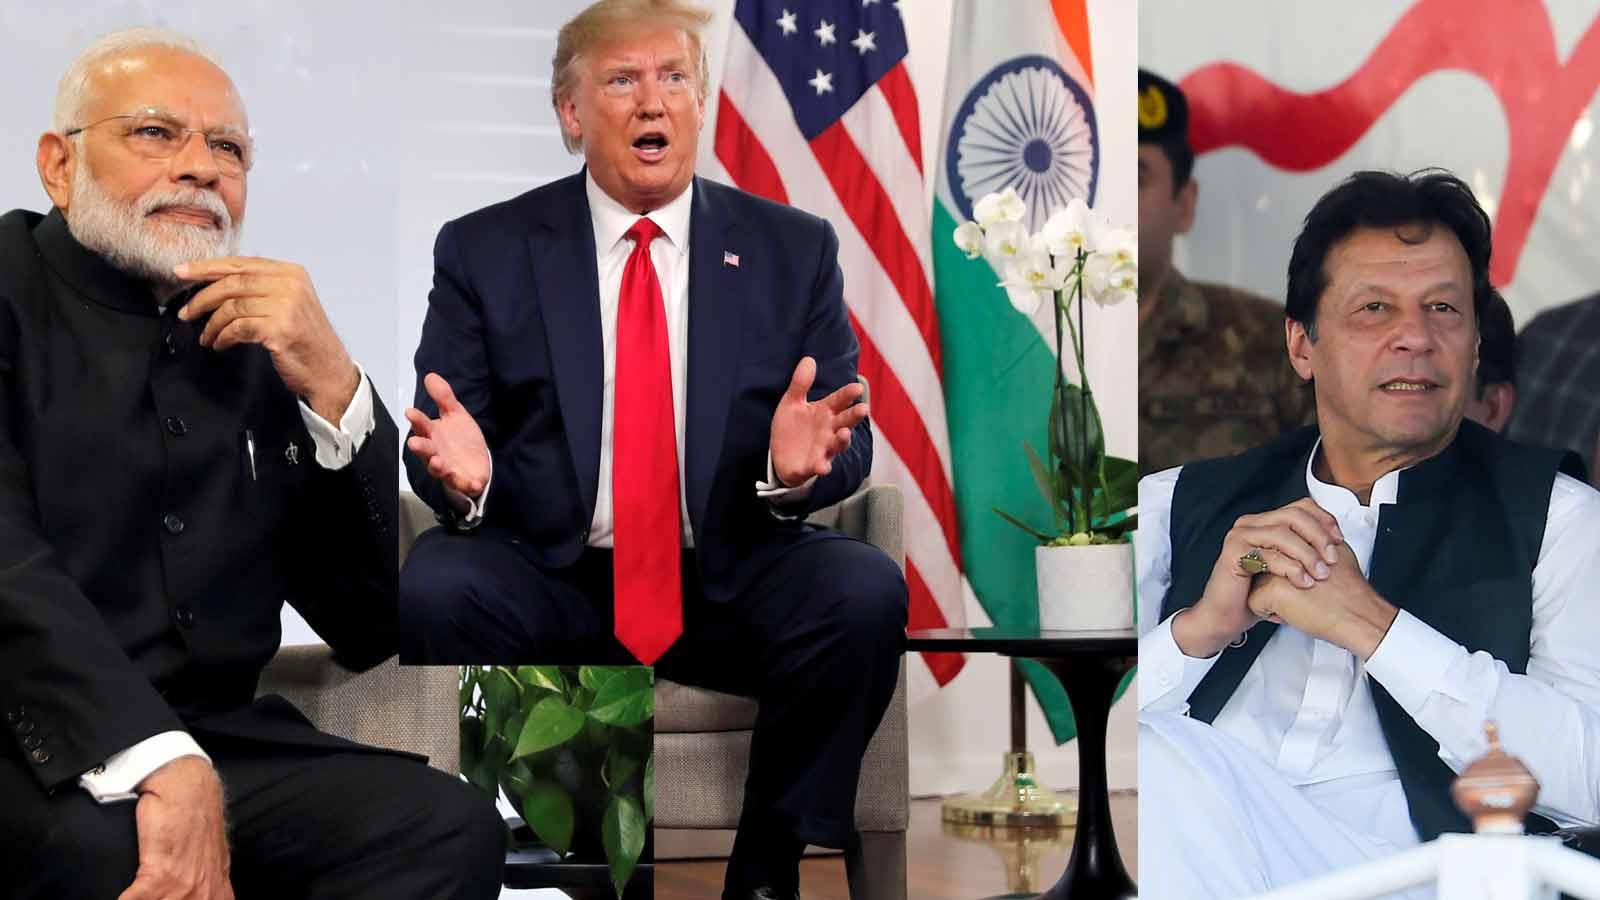 donald-trump-to-meet-pak-pm-imran-khan-a-day-after-he-joins-pm-narendra-modi-for-howdy-modi